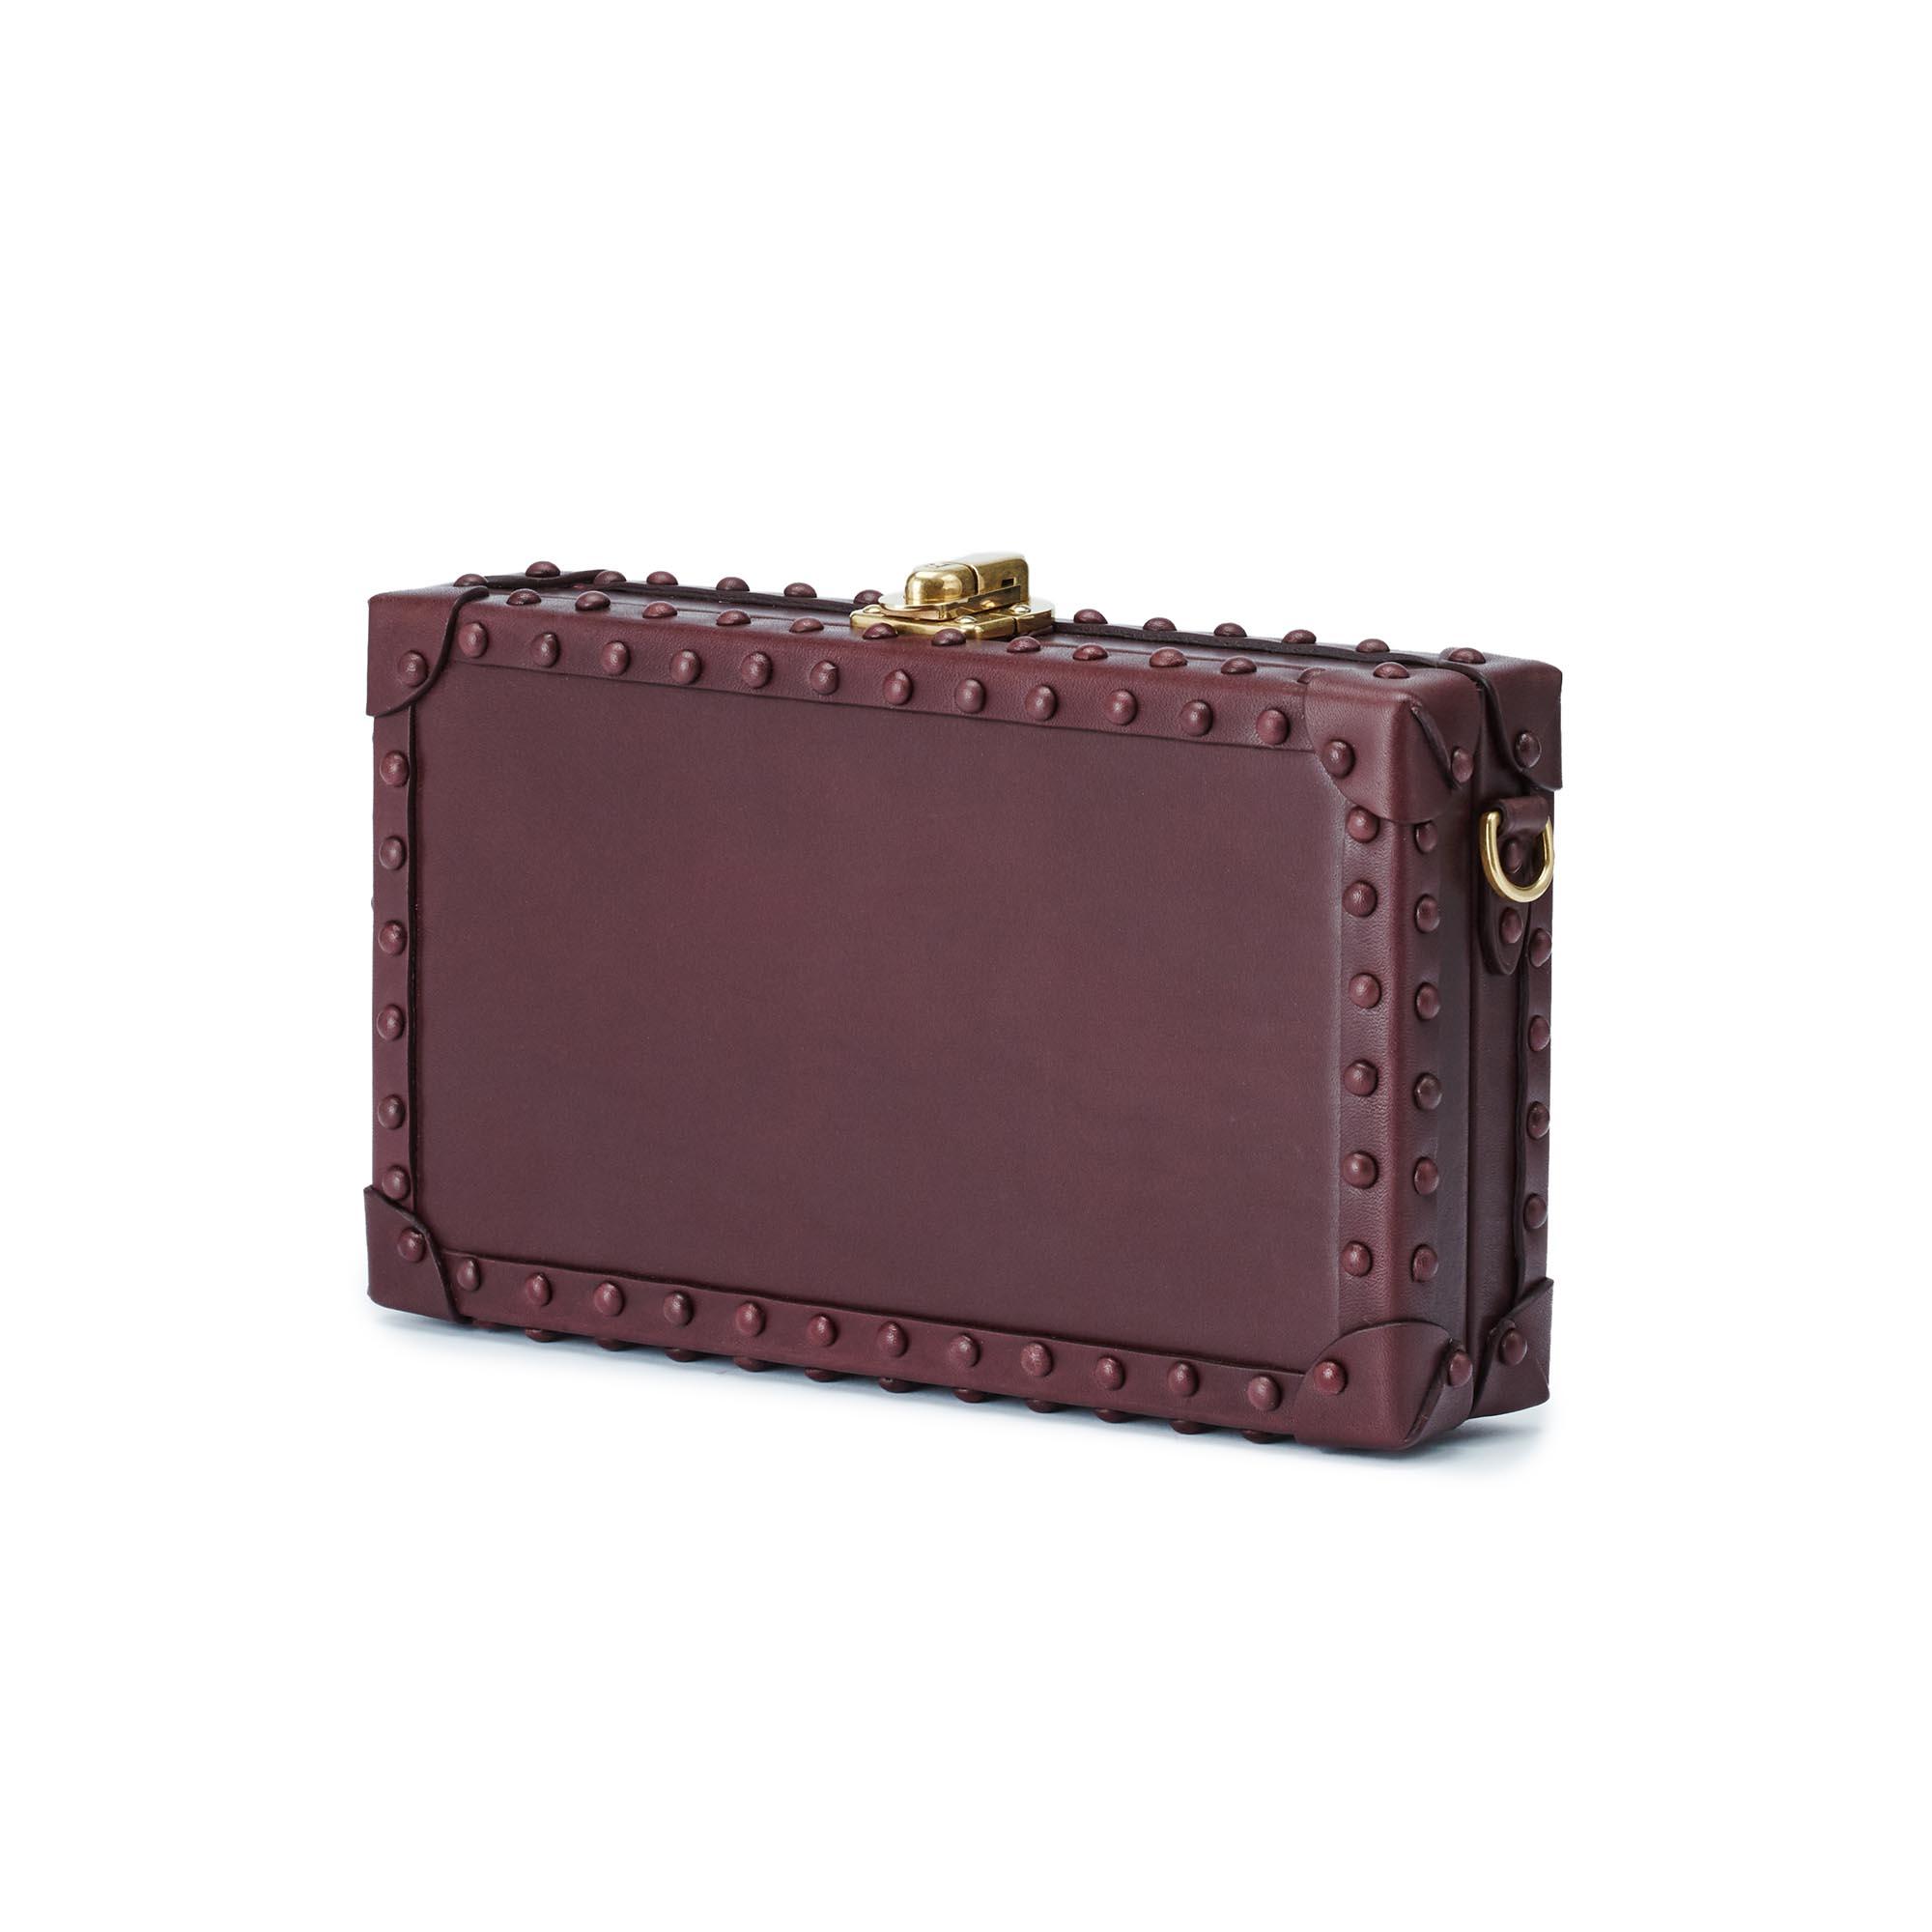 Box-Bertoncina-bordeaux-studded-french-calf-bag-Bertoni-1949_02